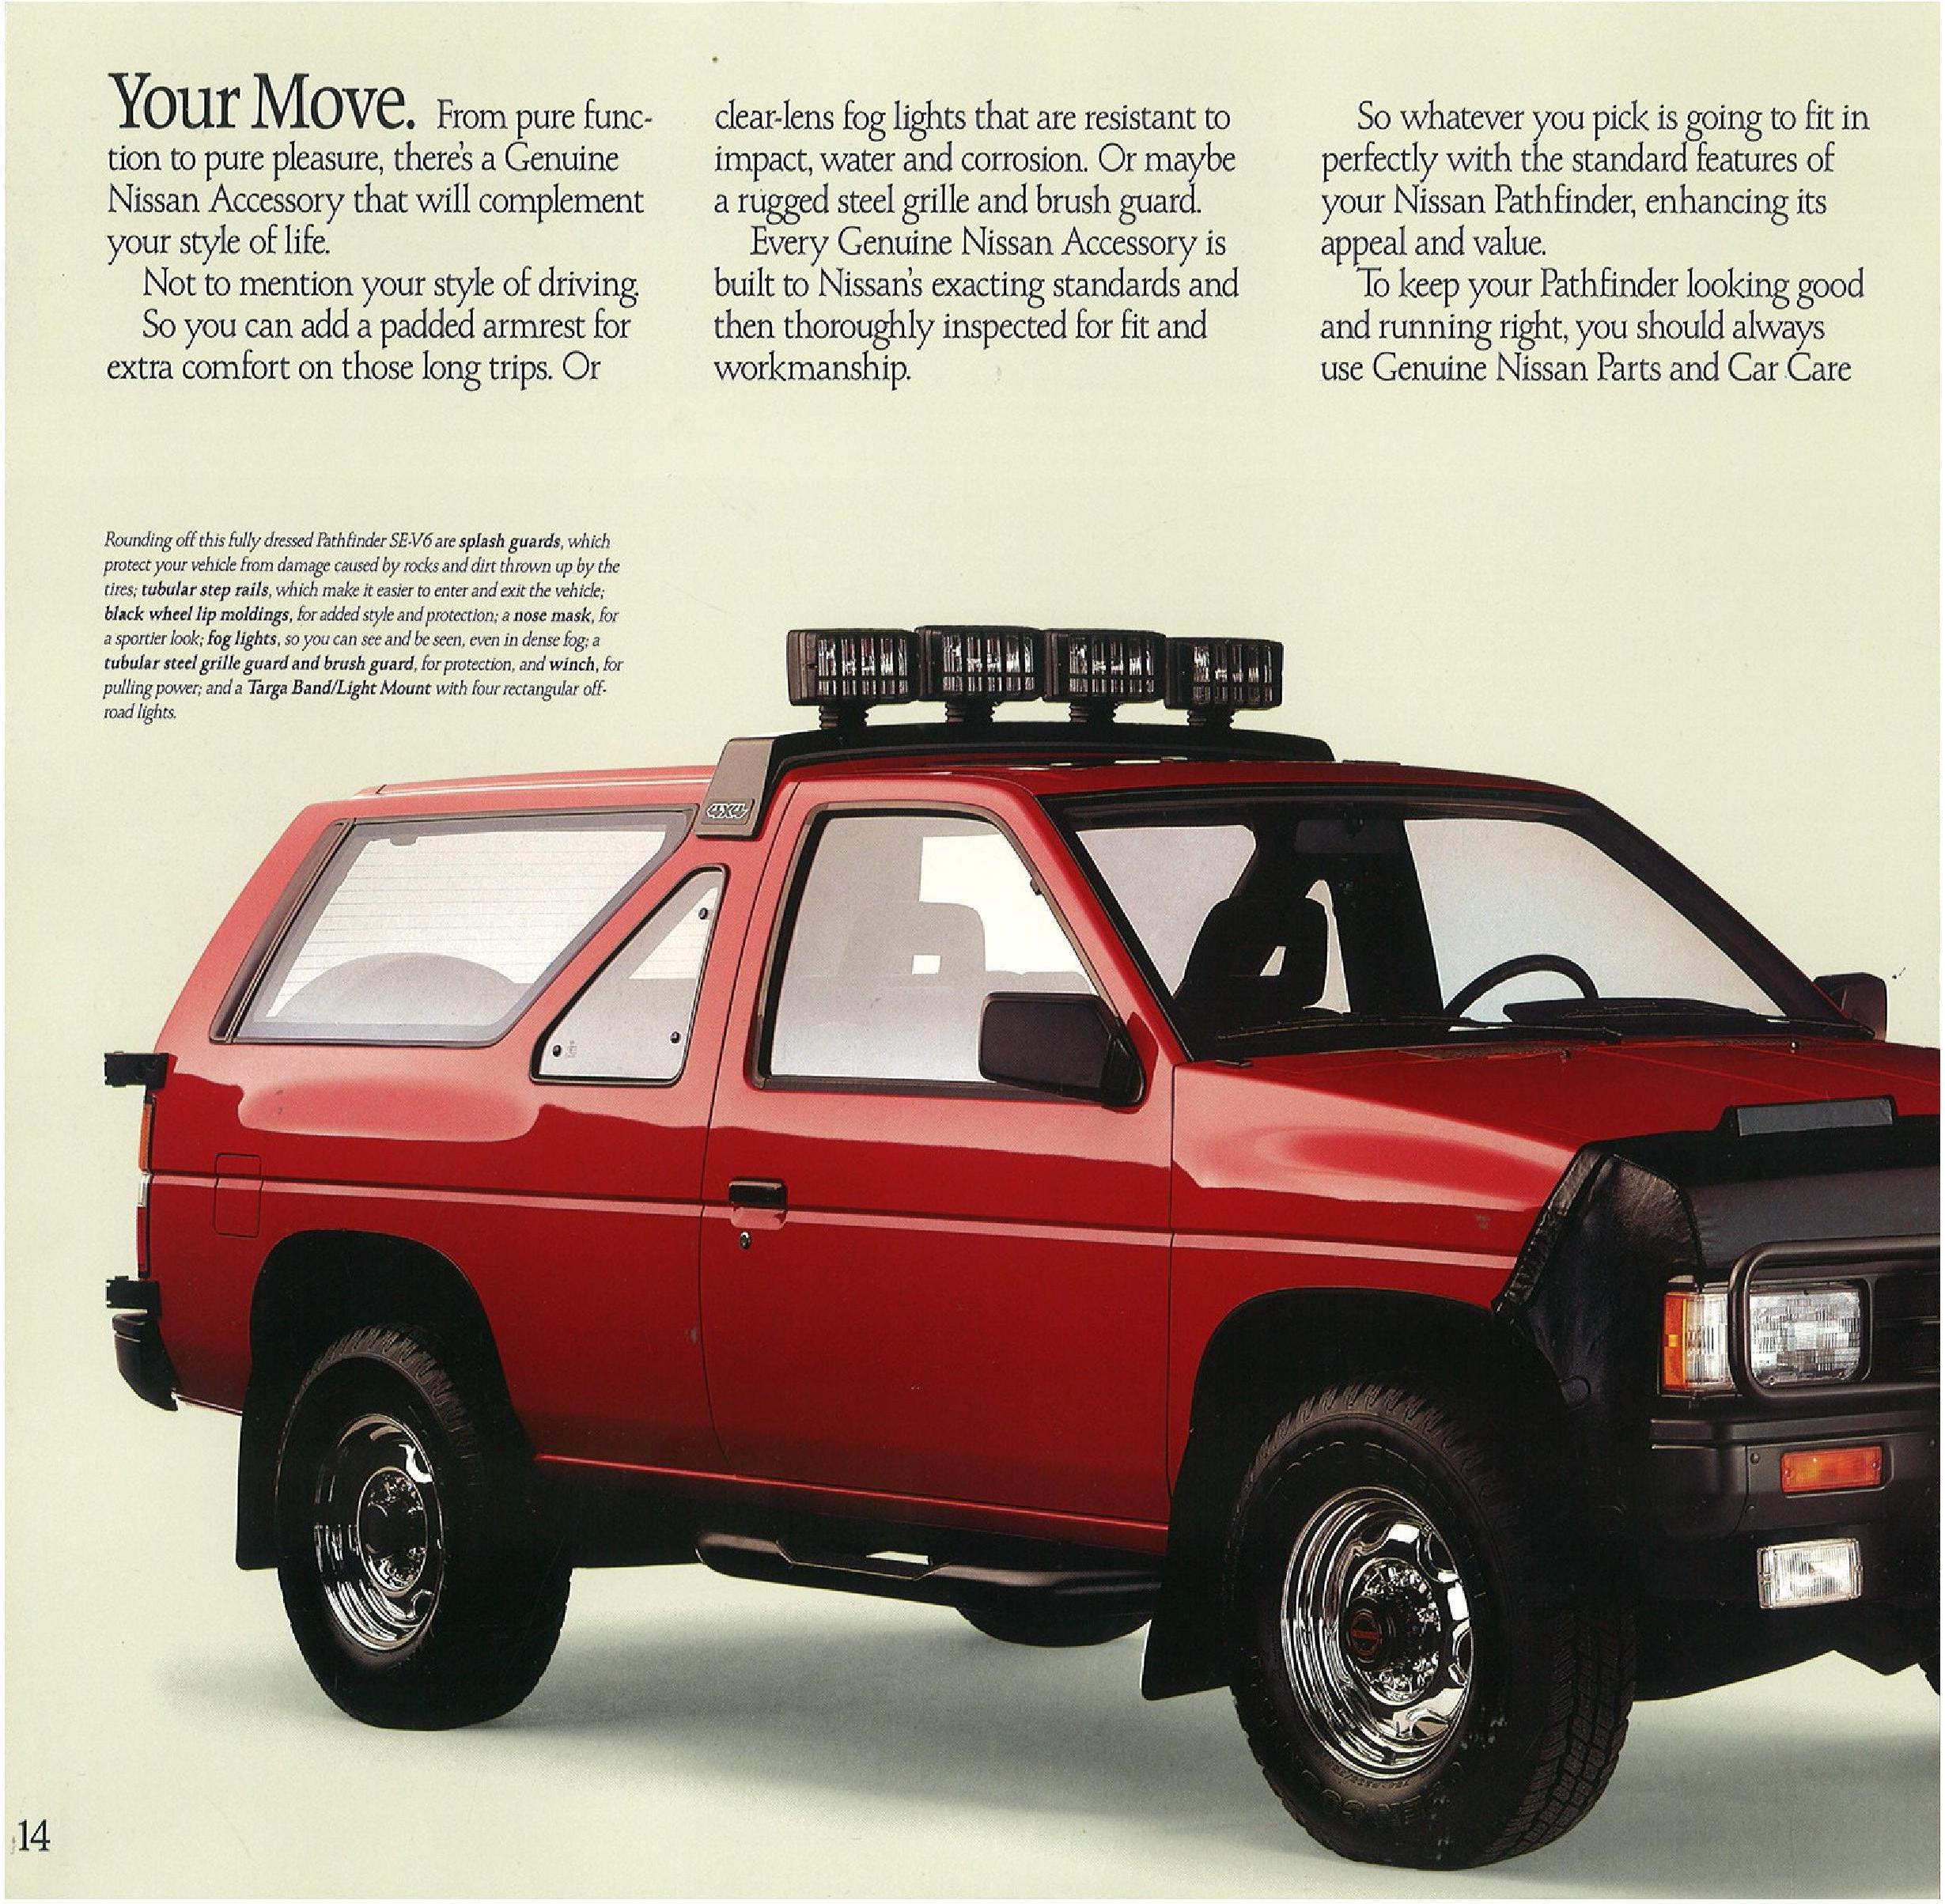 1989 Nissan Pathfinder Dealer Brochure - NICOclub